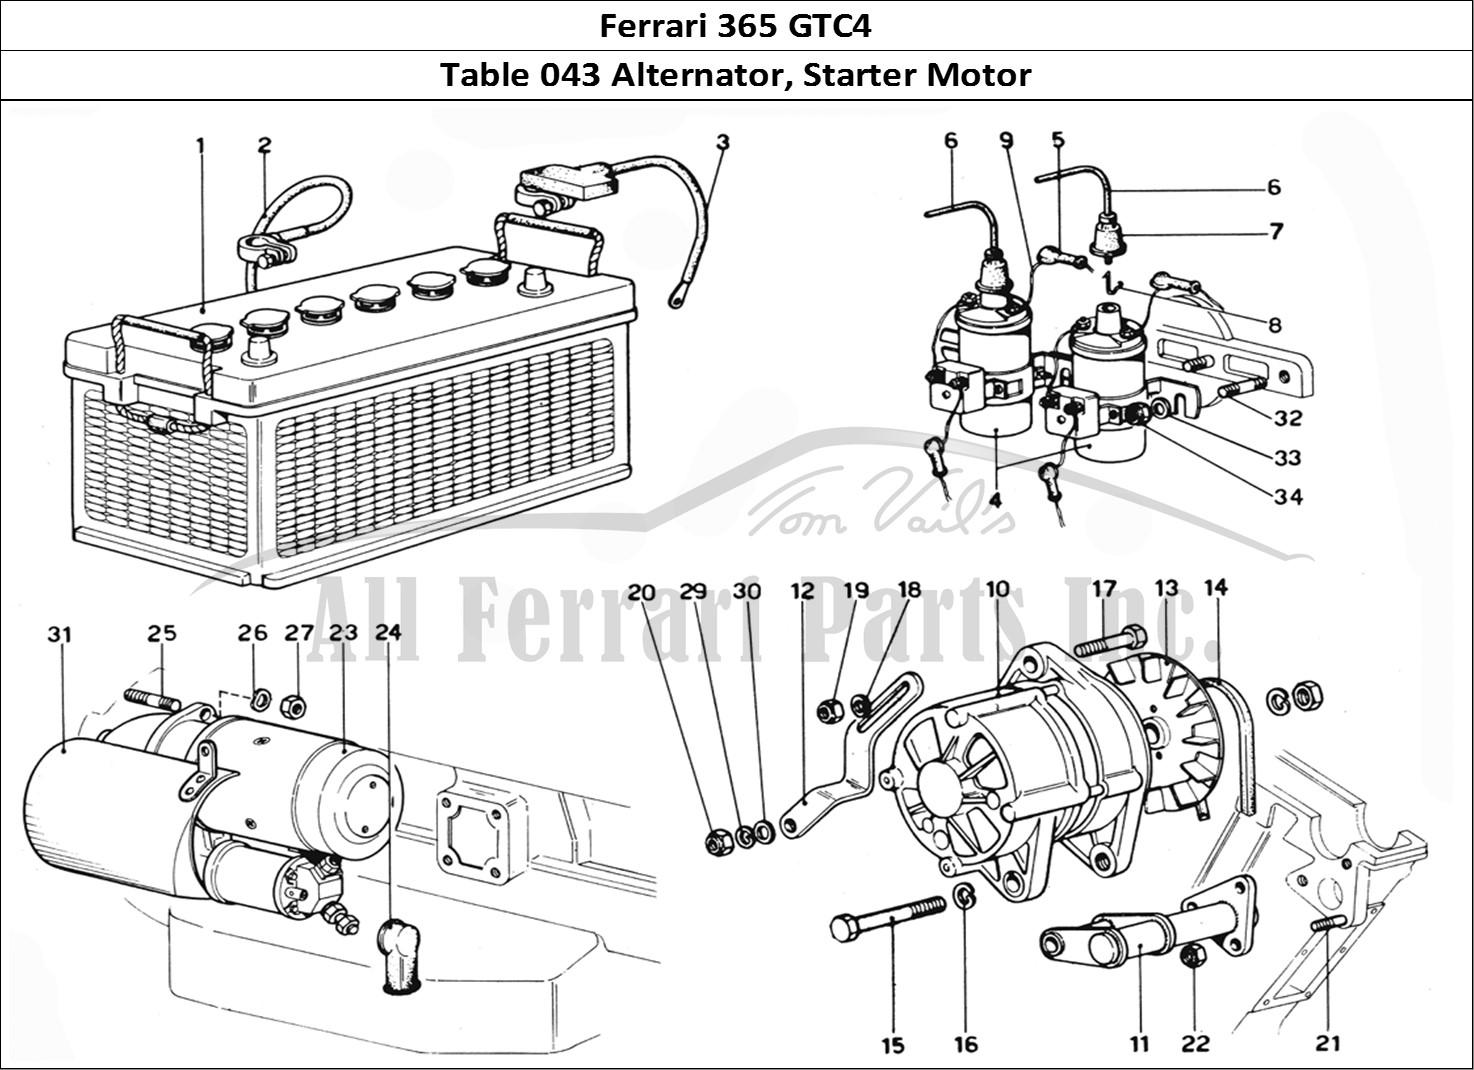 Buy original Ferrari 365 GTC4 043 Alternator, Starter